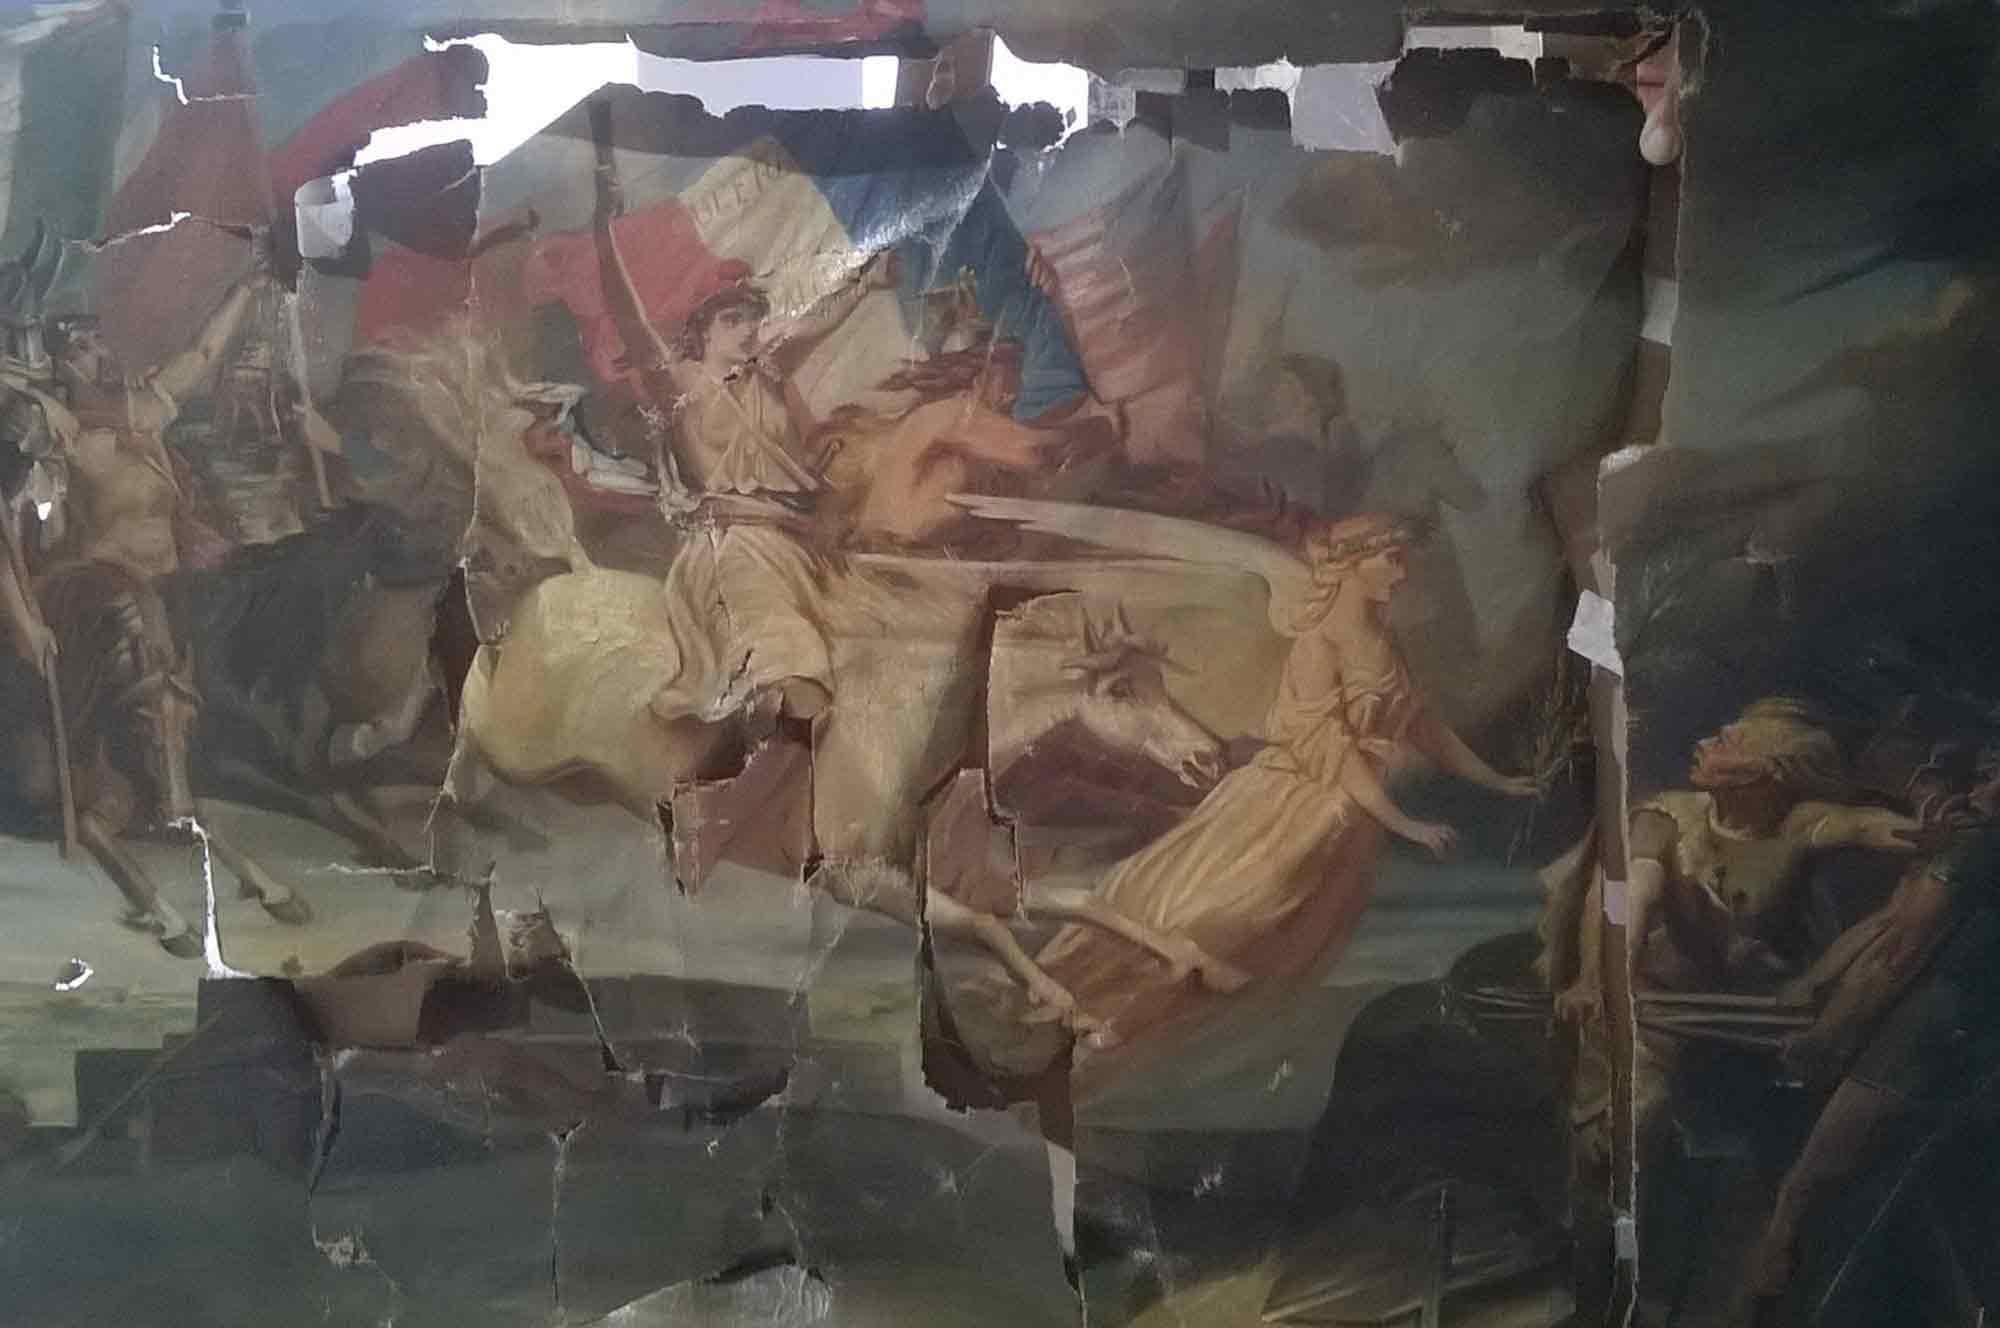 L'art en Héritage | lartenheritage.fr